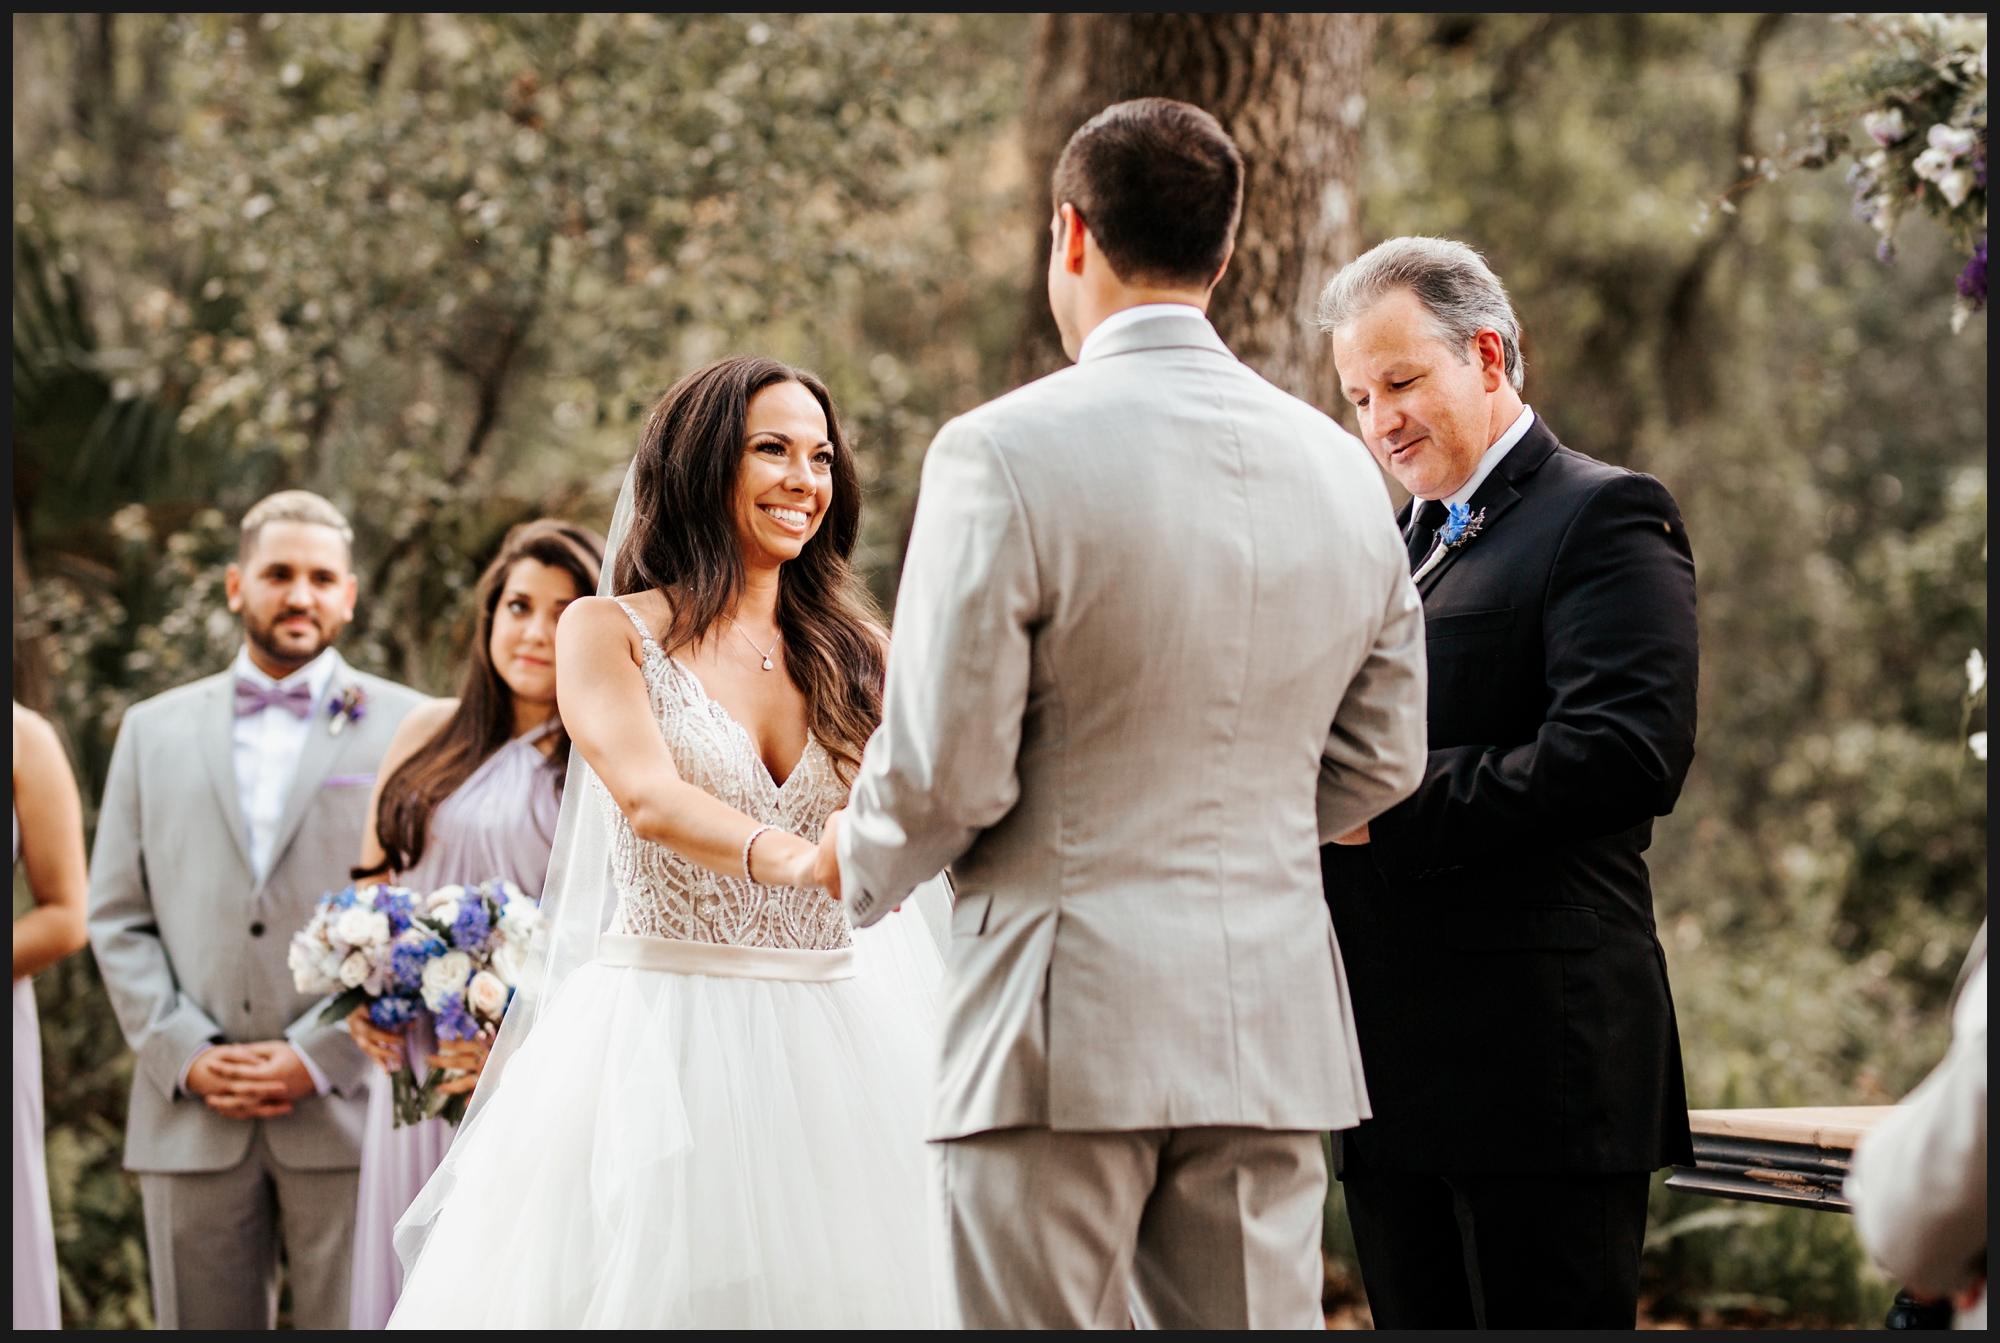 Orlando-Wedding-Photographer-destination-wedding-photographer-florida-wedding-photographer-bohemian-wedding-photographer_1611.jpg